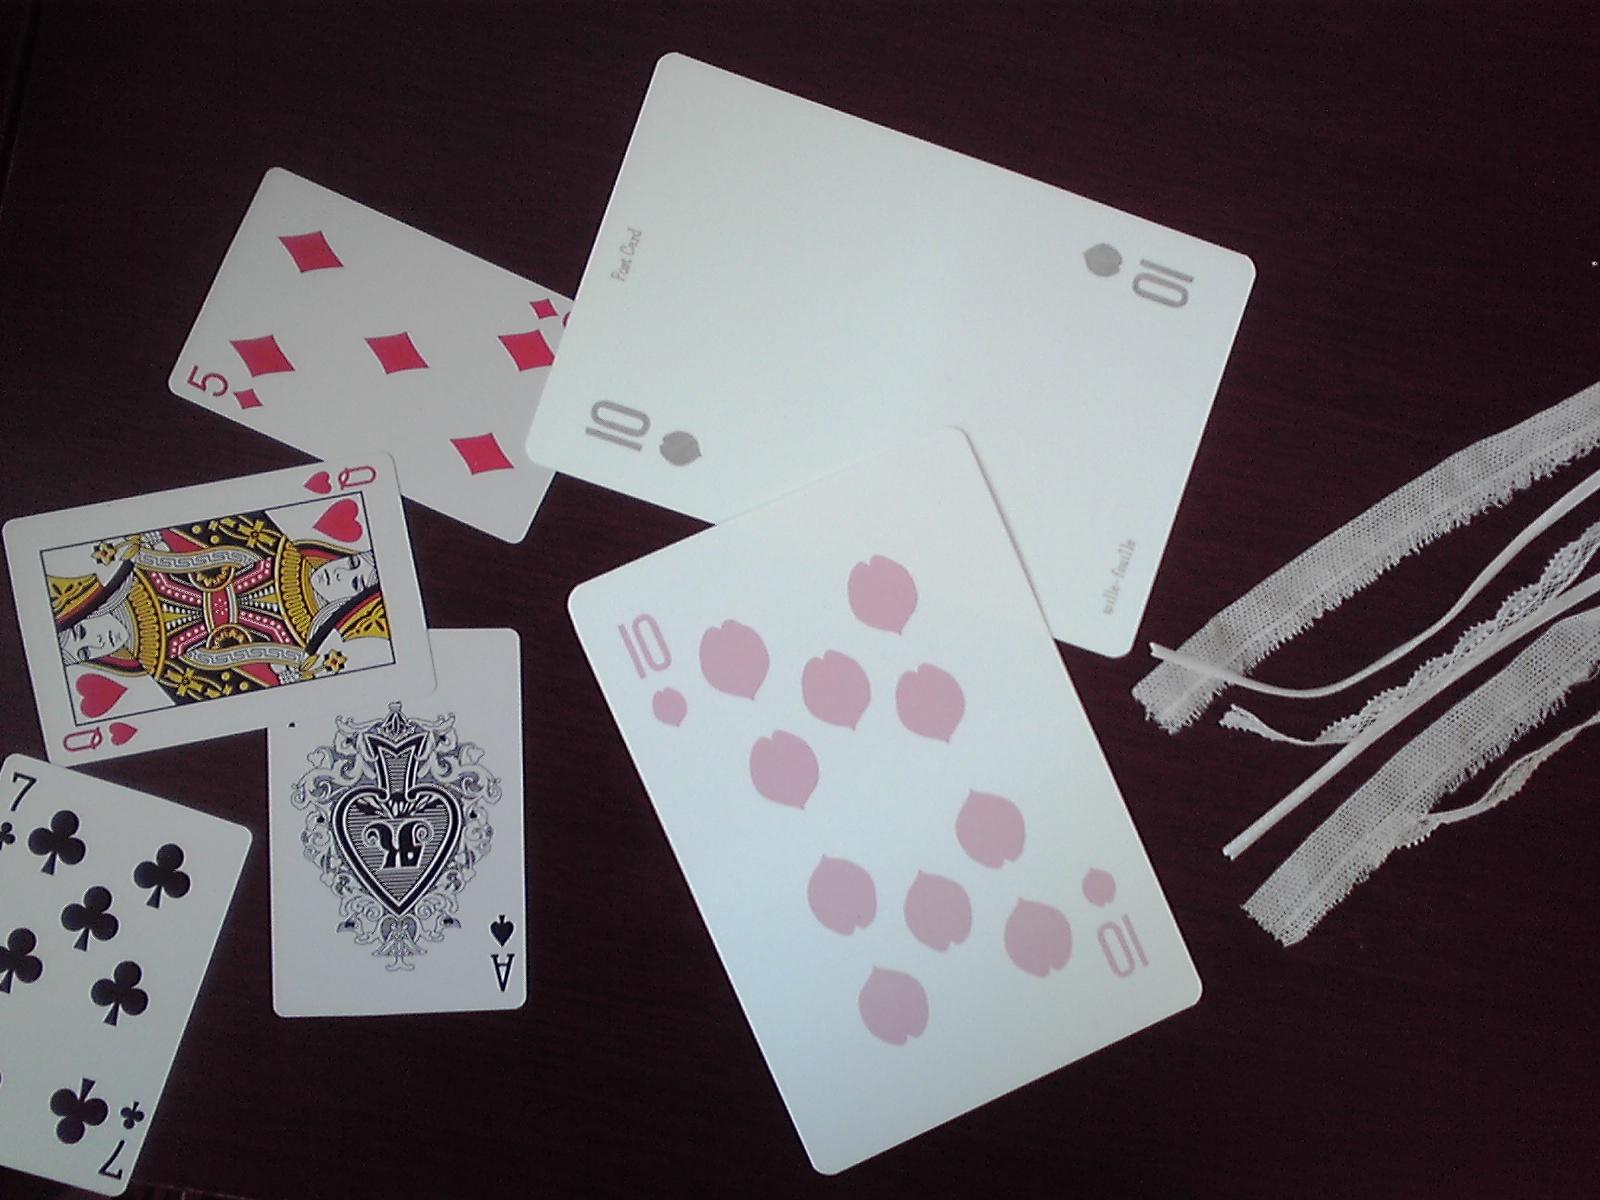 【Lykkelig】ポストカード「さくらトランプ」追加!